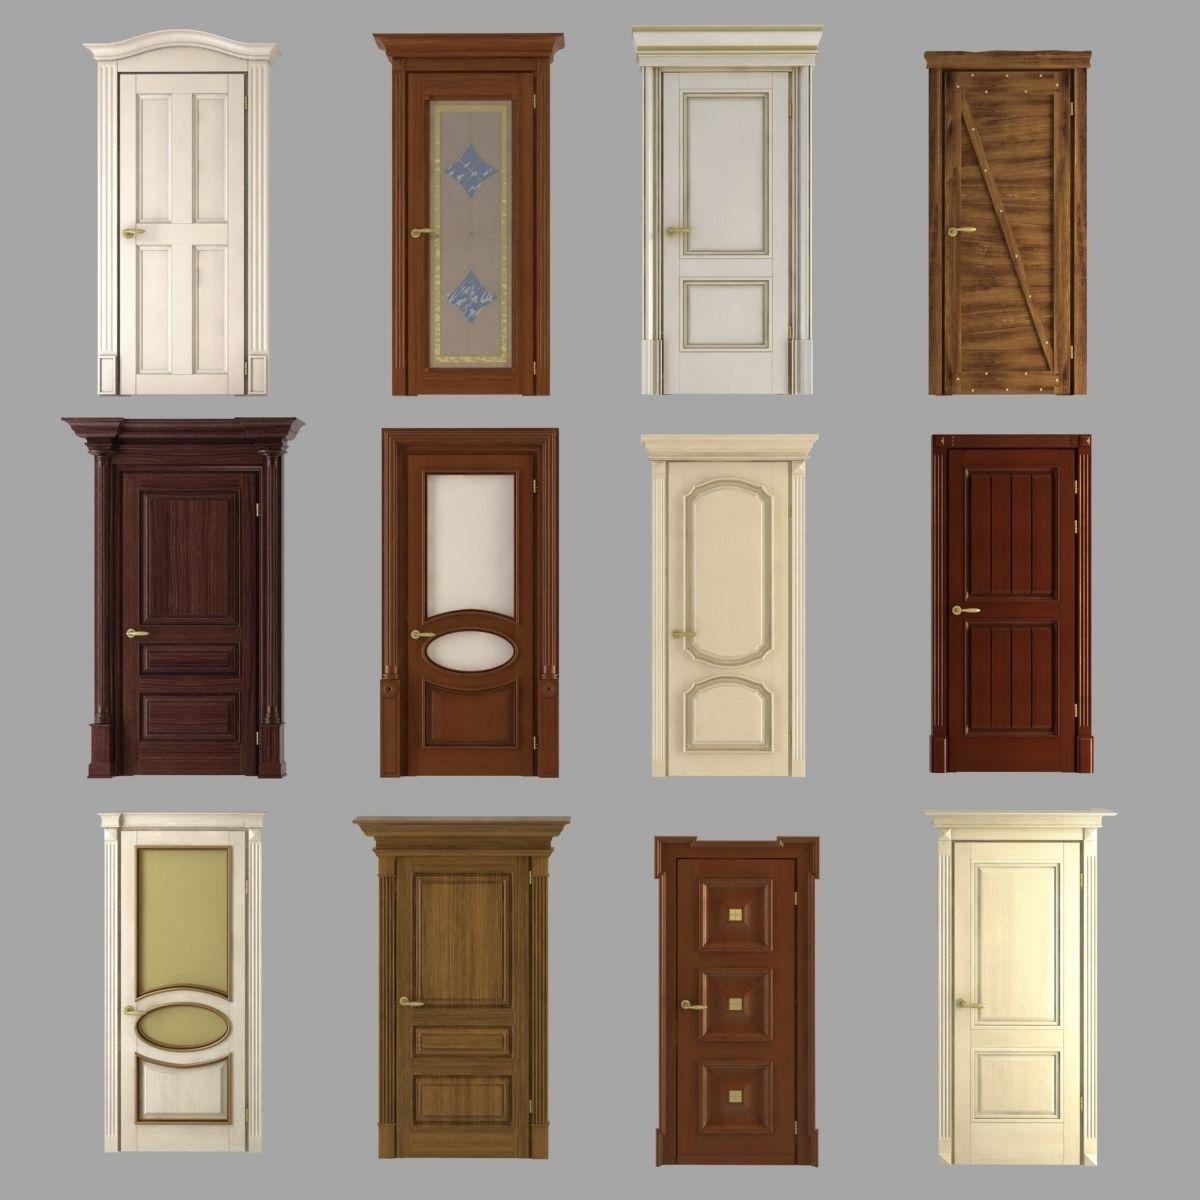 Classic doors collection 3d model max obj 3ds fbx for Door 3d model